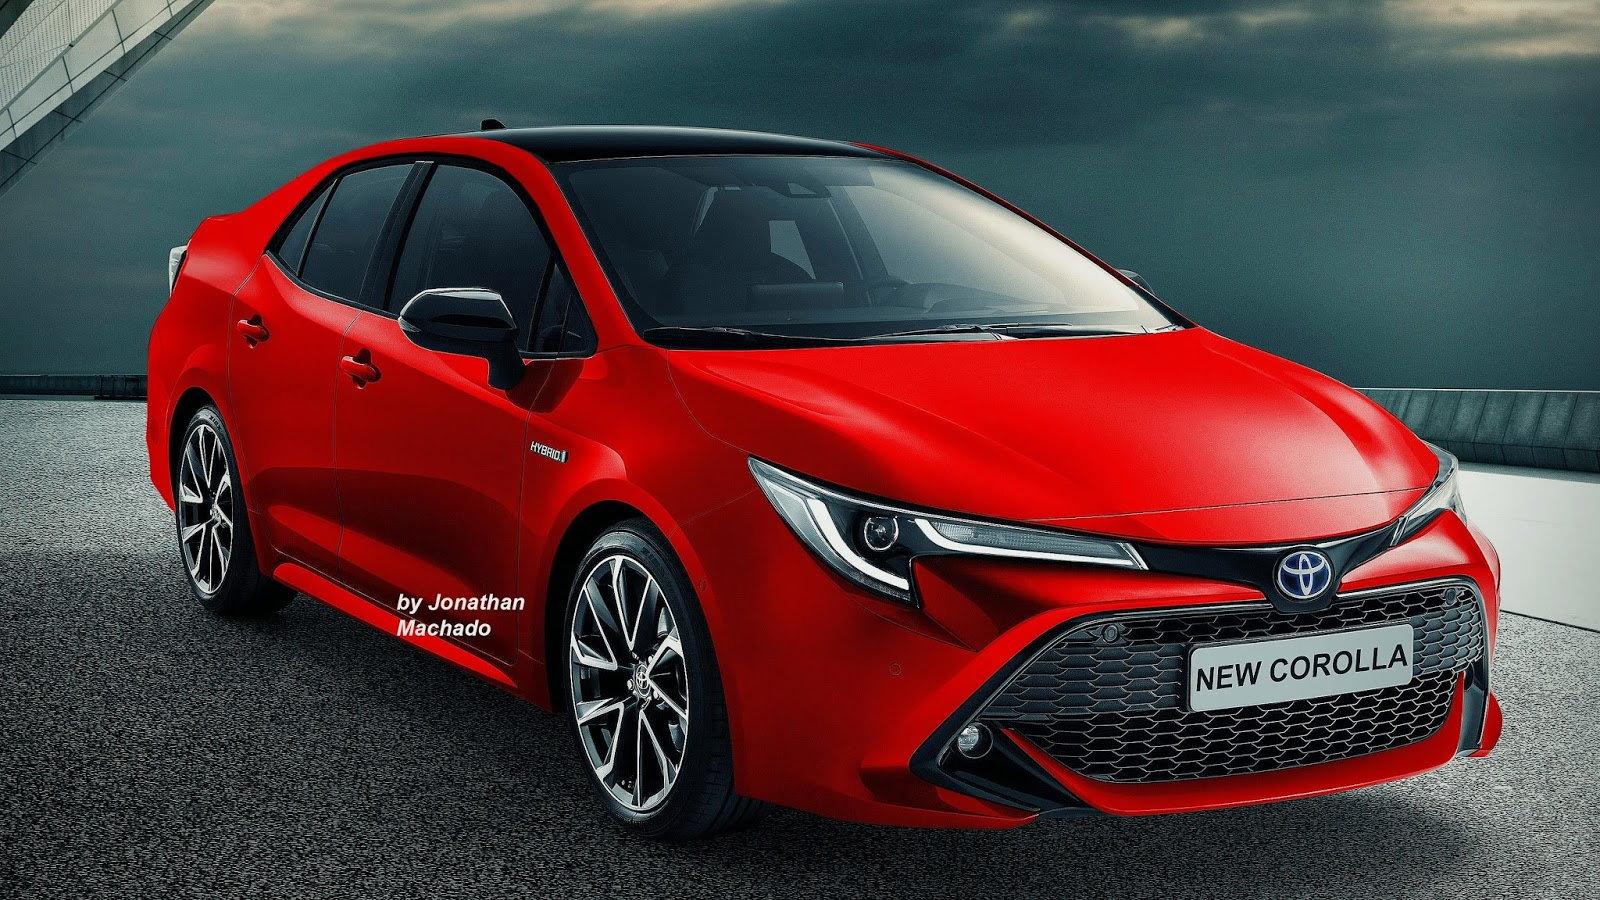 2020 Corolla spied!! - ClubLexus - Lexus Forum Discussion